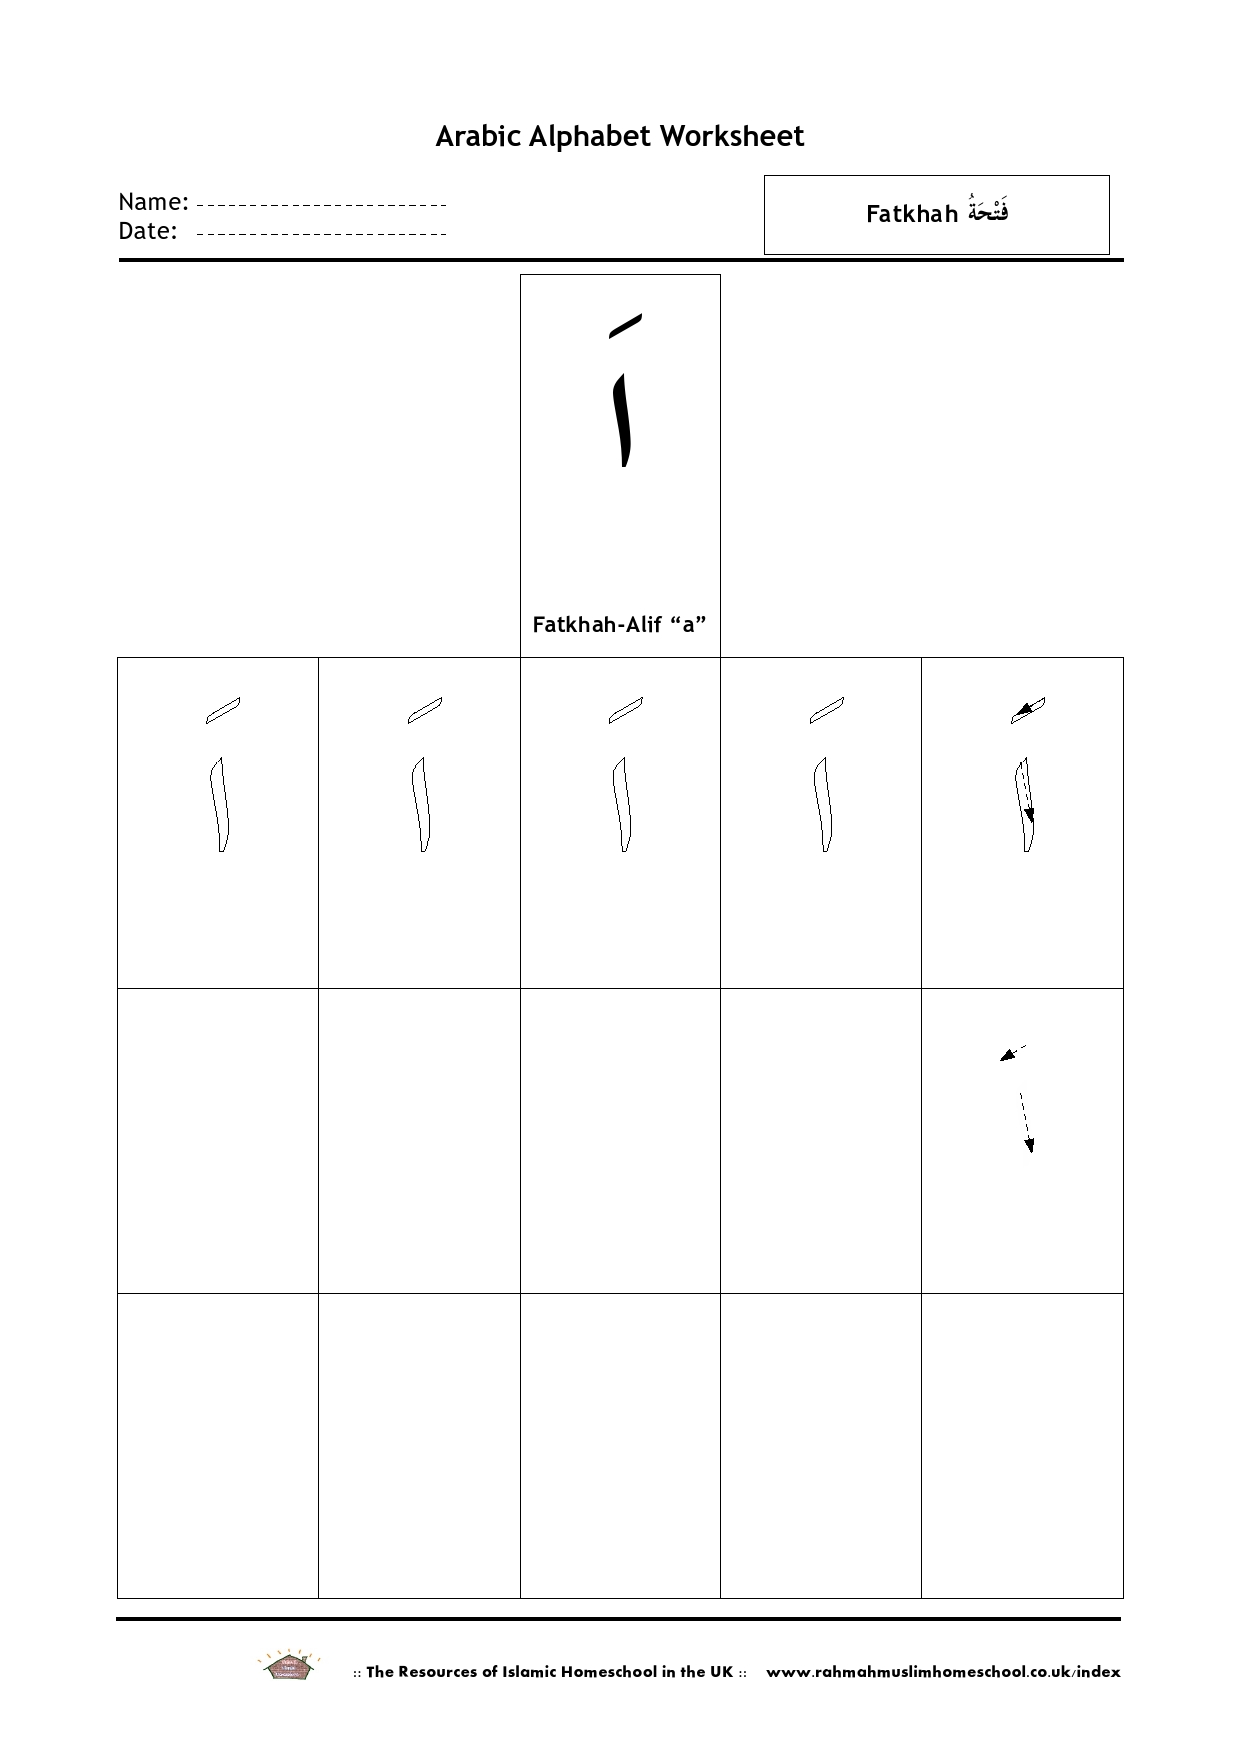 Free Arabic Alphabet Worksheet Fatkhah Alif A